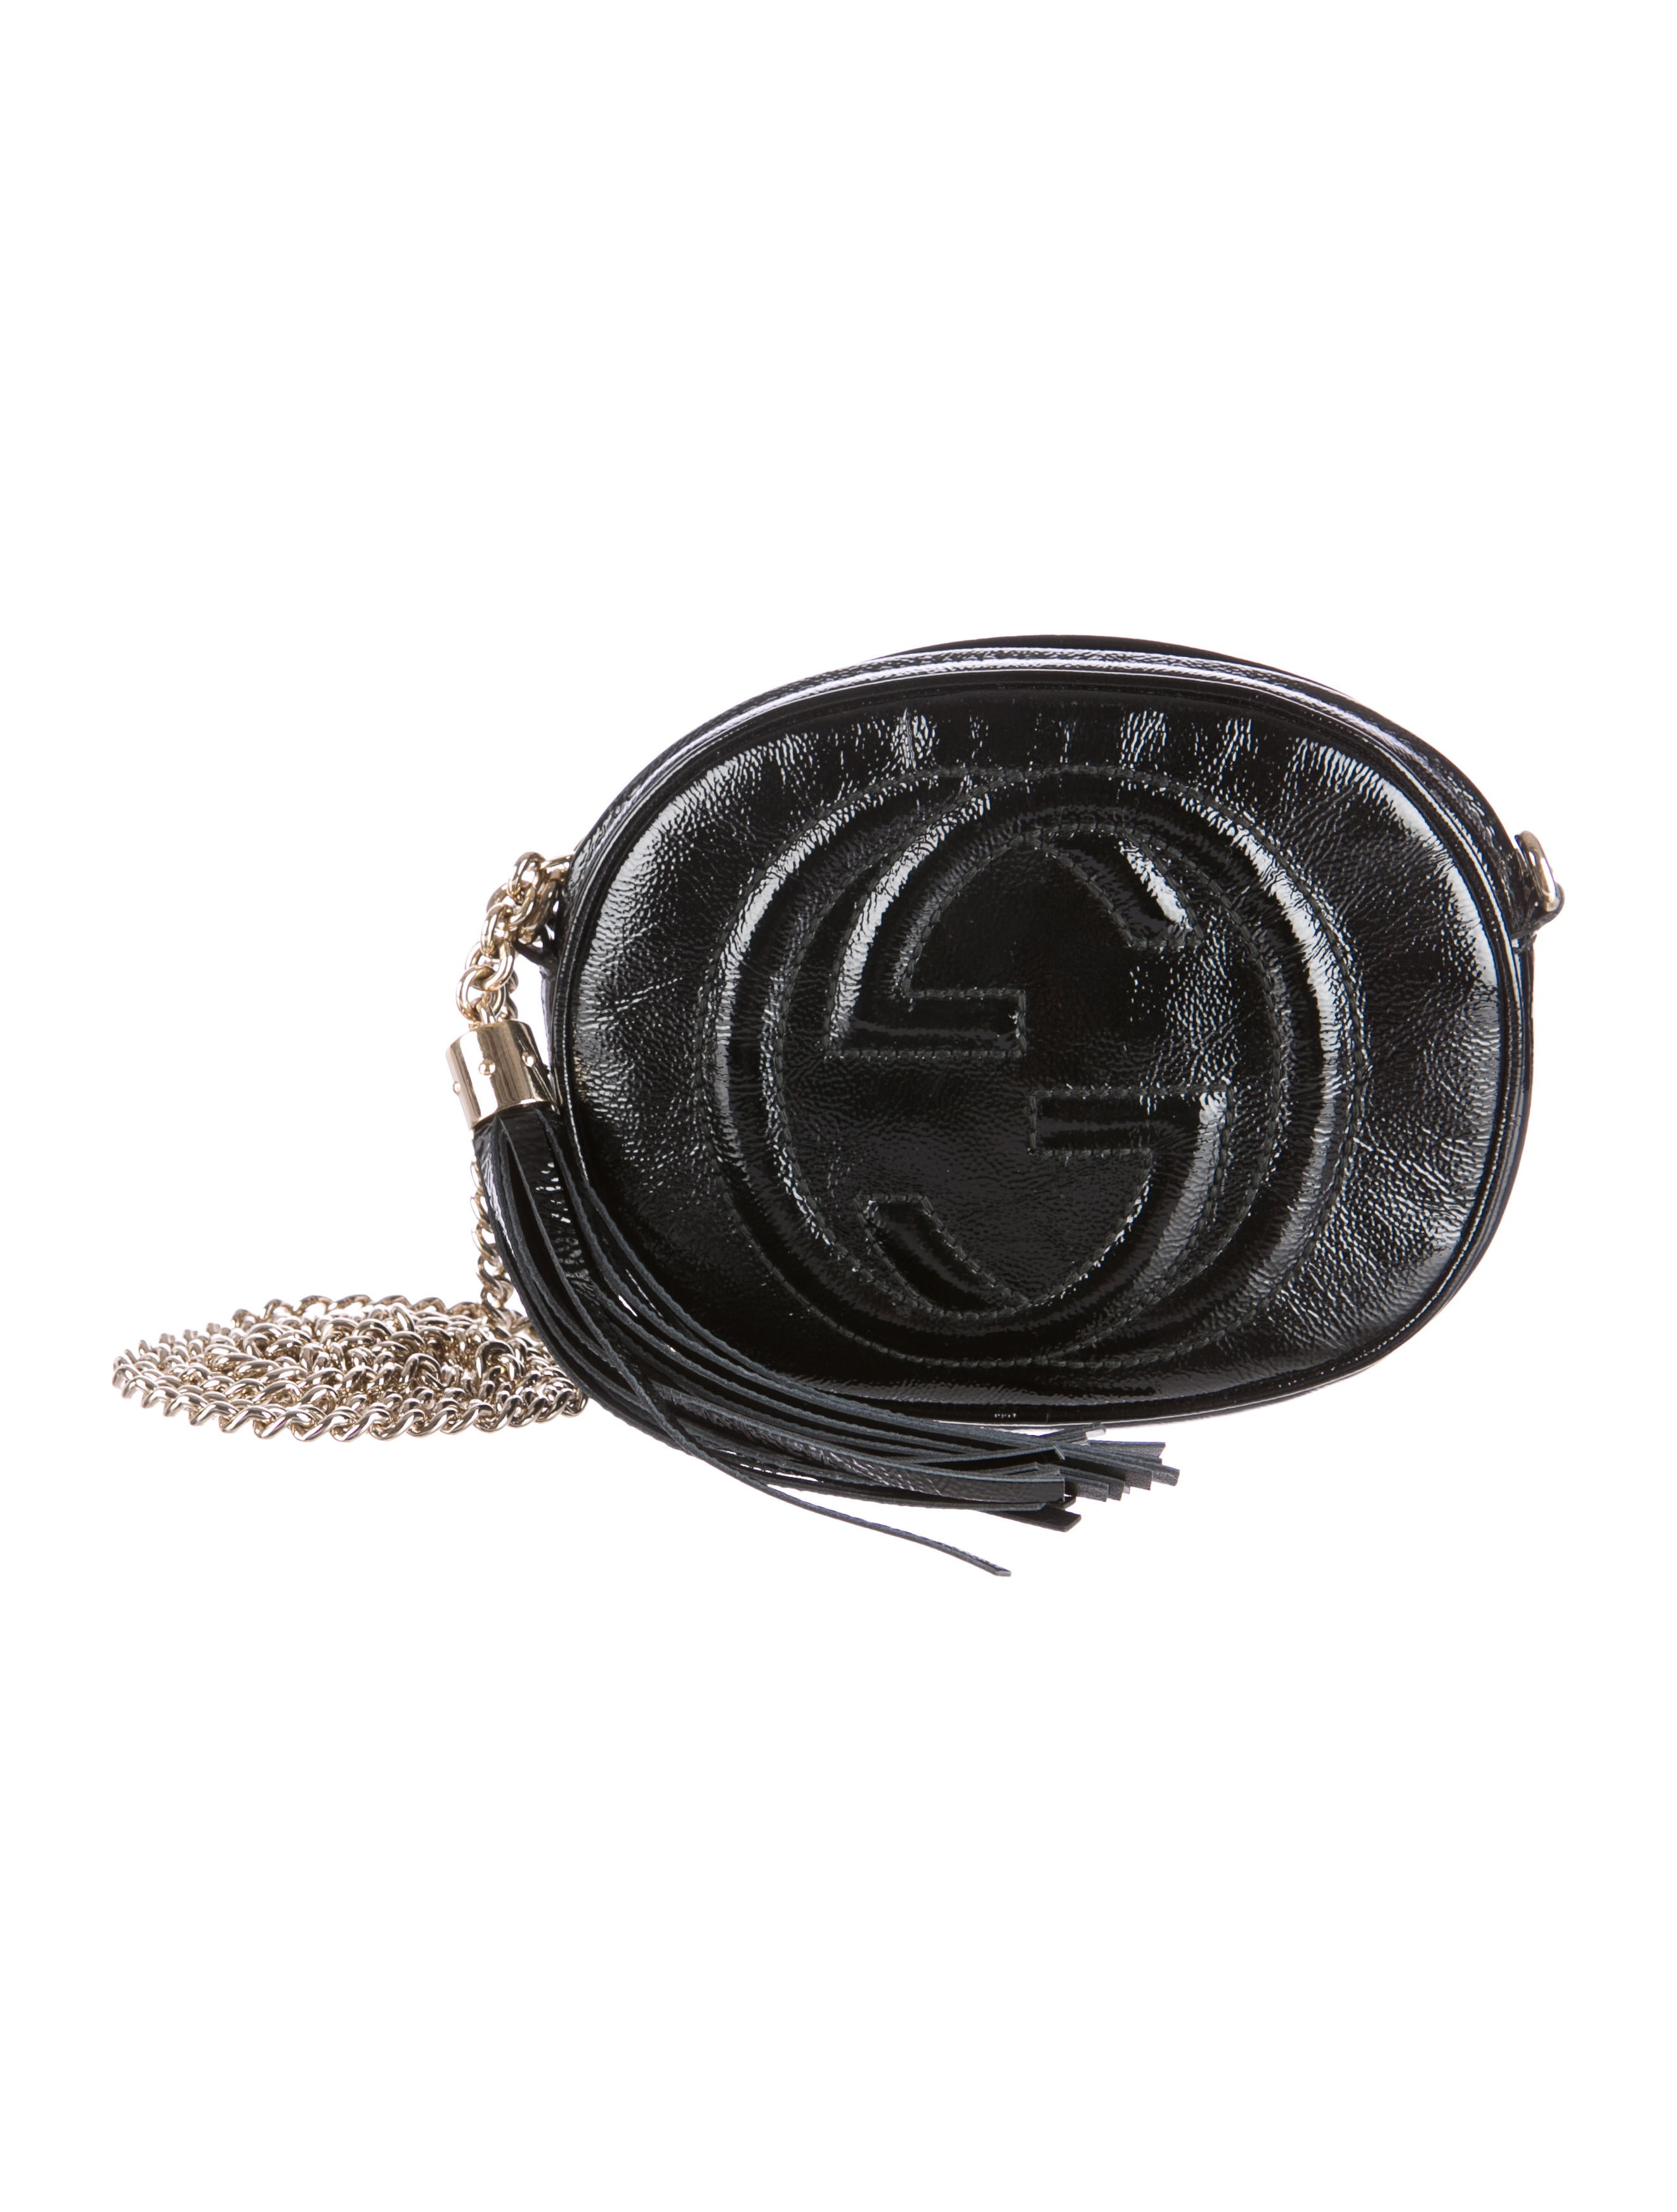 da56223060e1 Gucci Soho Leather Mini Chain Bag Black - Best Model Bag 2018